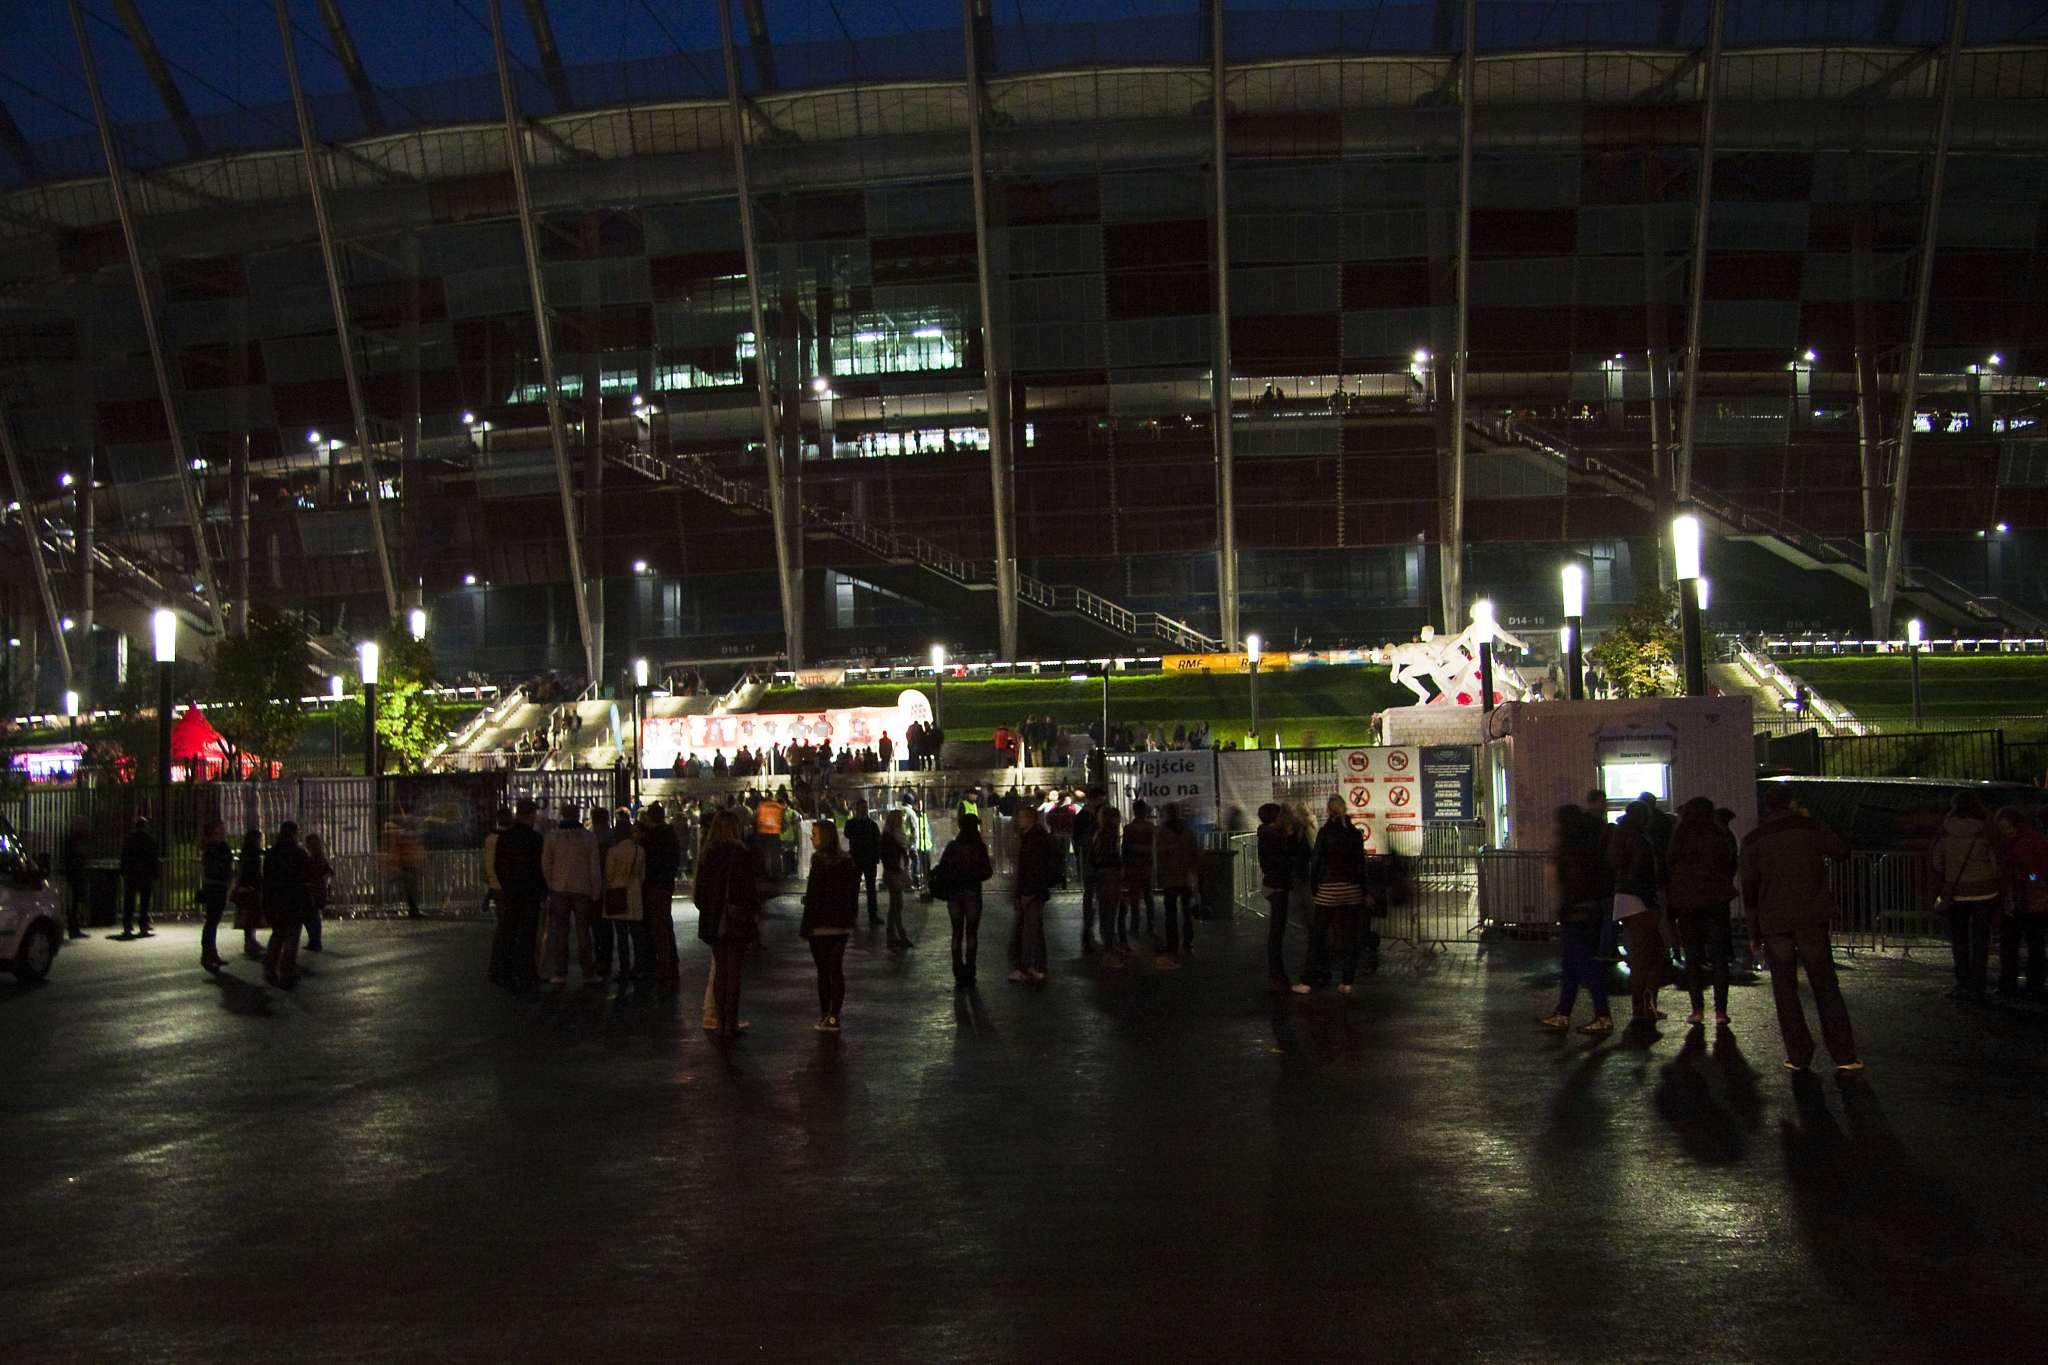 Narodowy Stadium detail